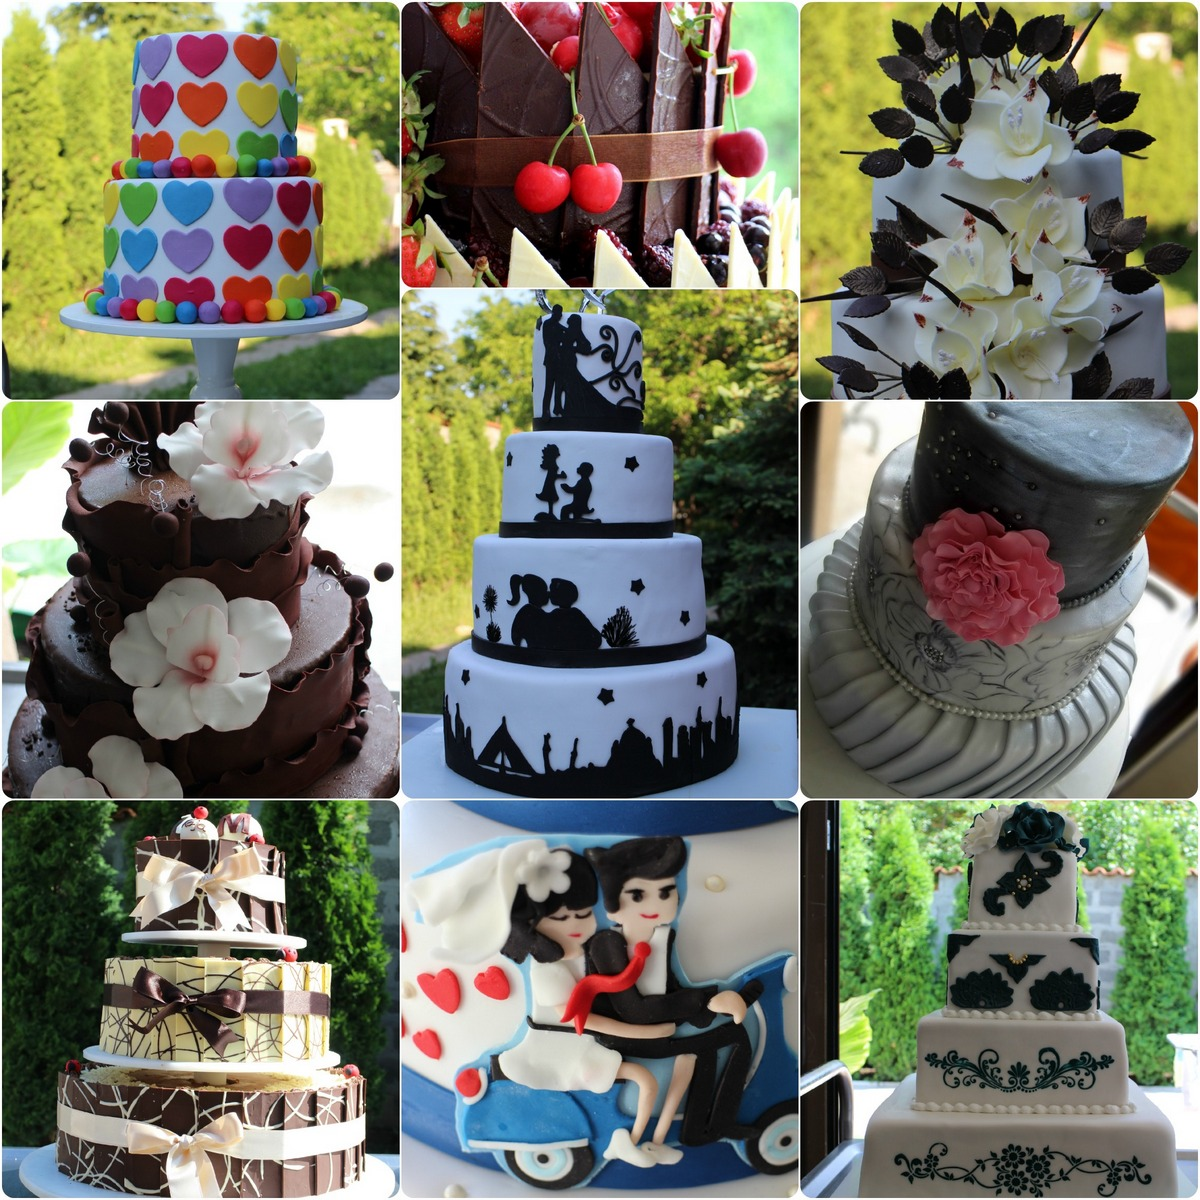 svadbaivencanje-poco-l-torte